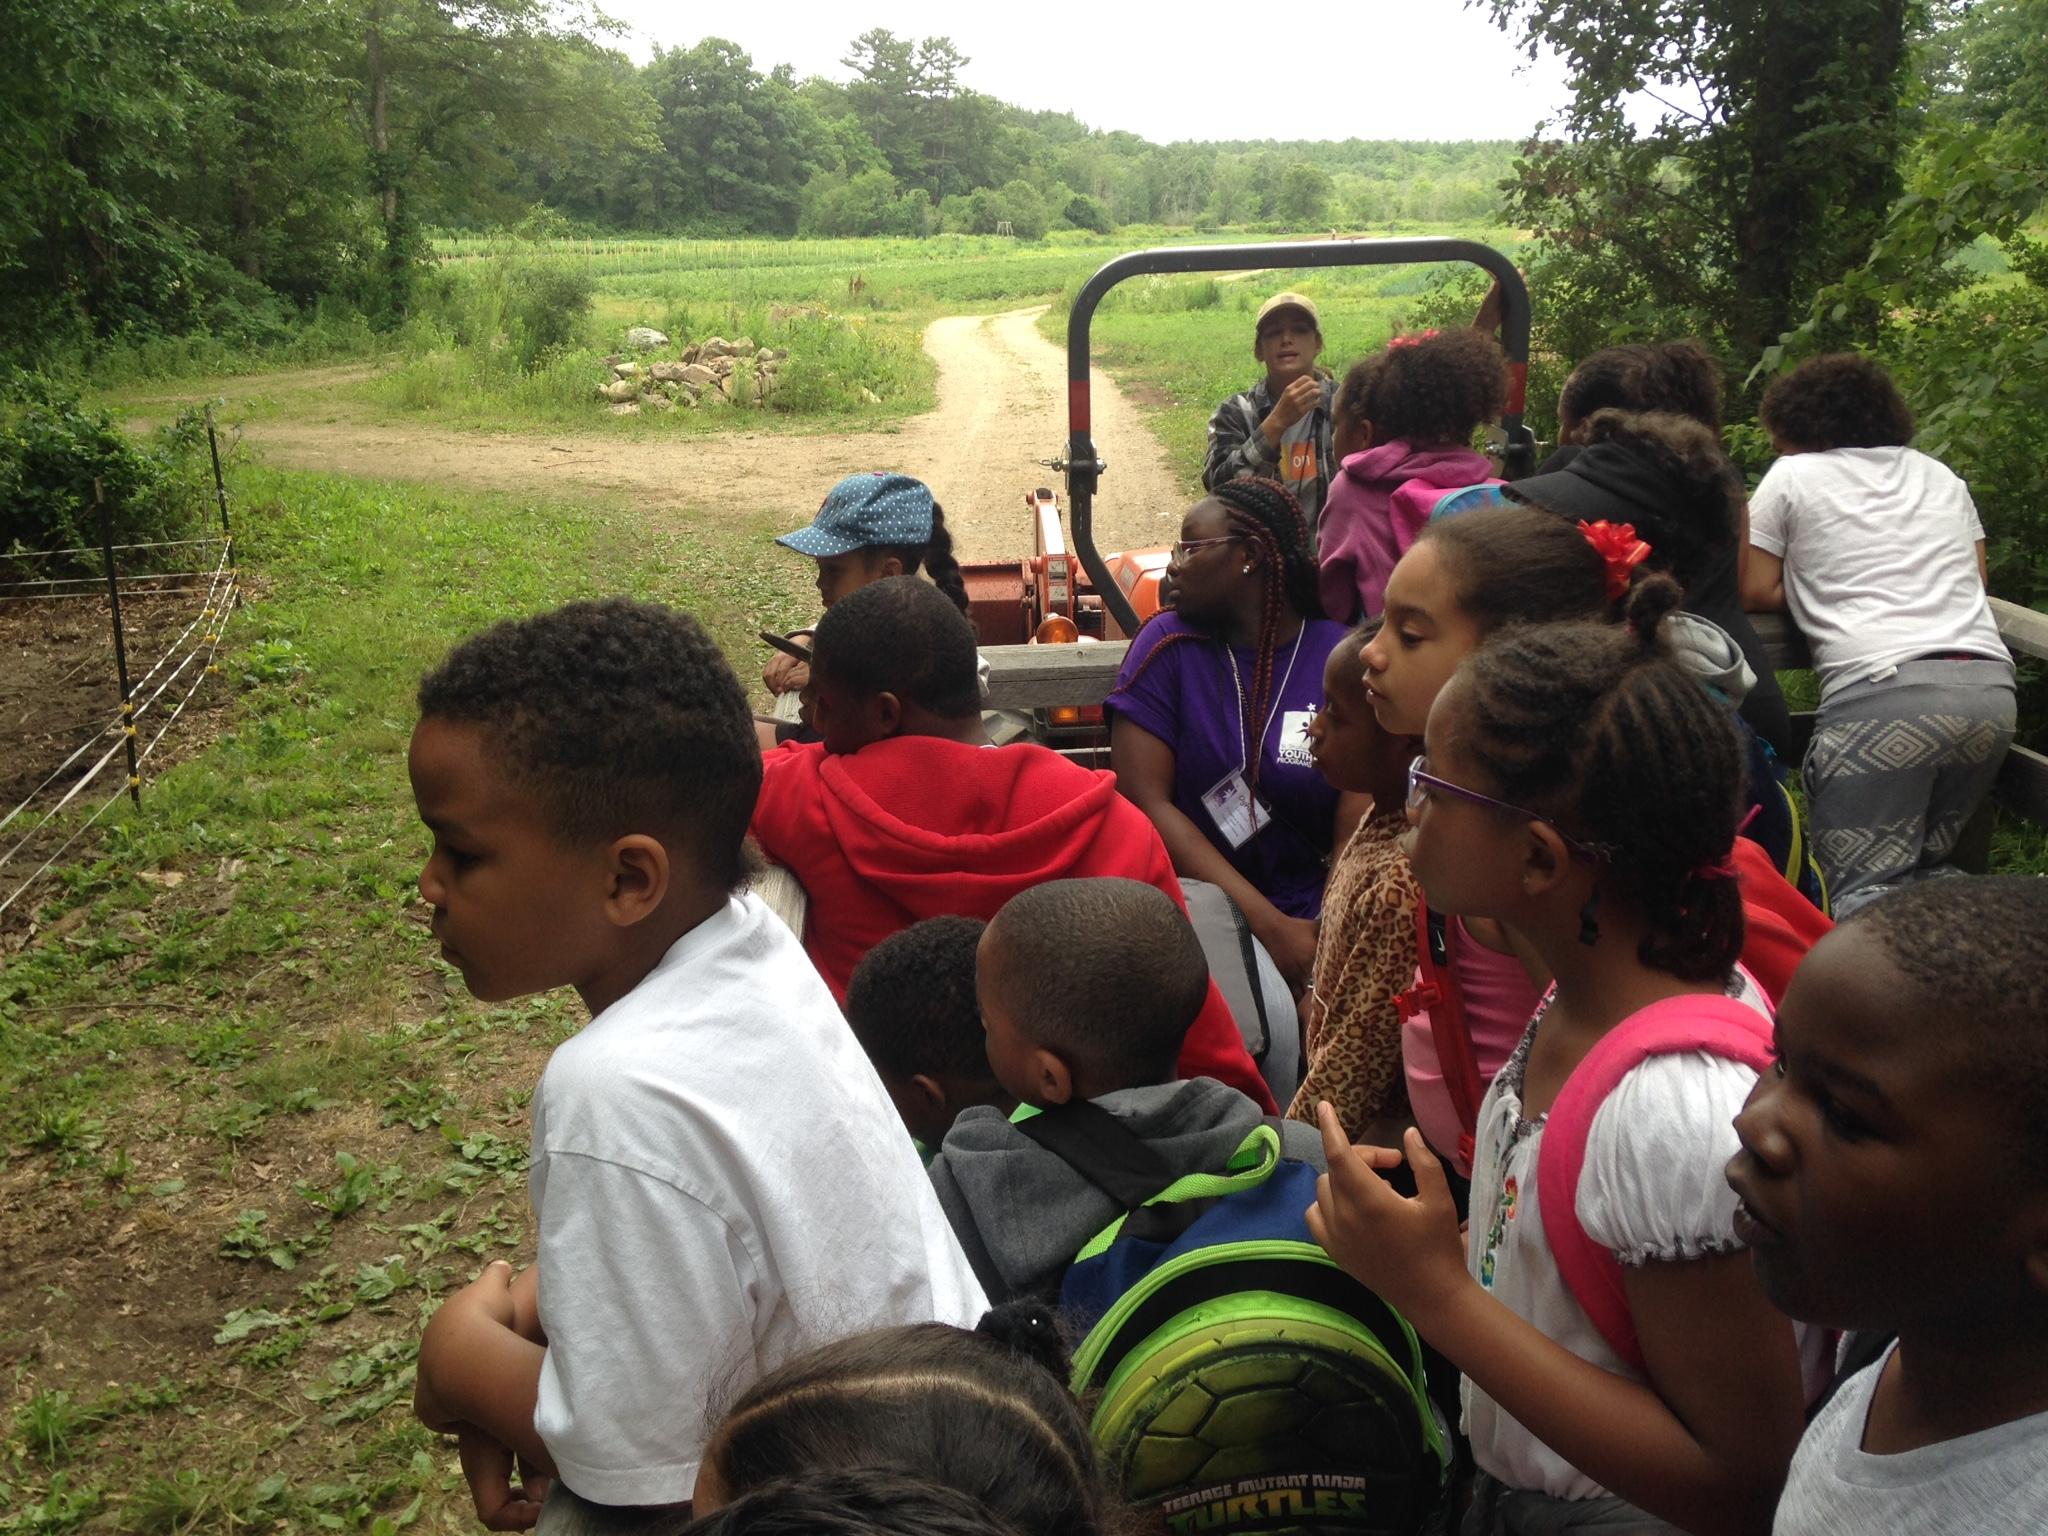 Kids on tour of Green Meadow Farm